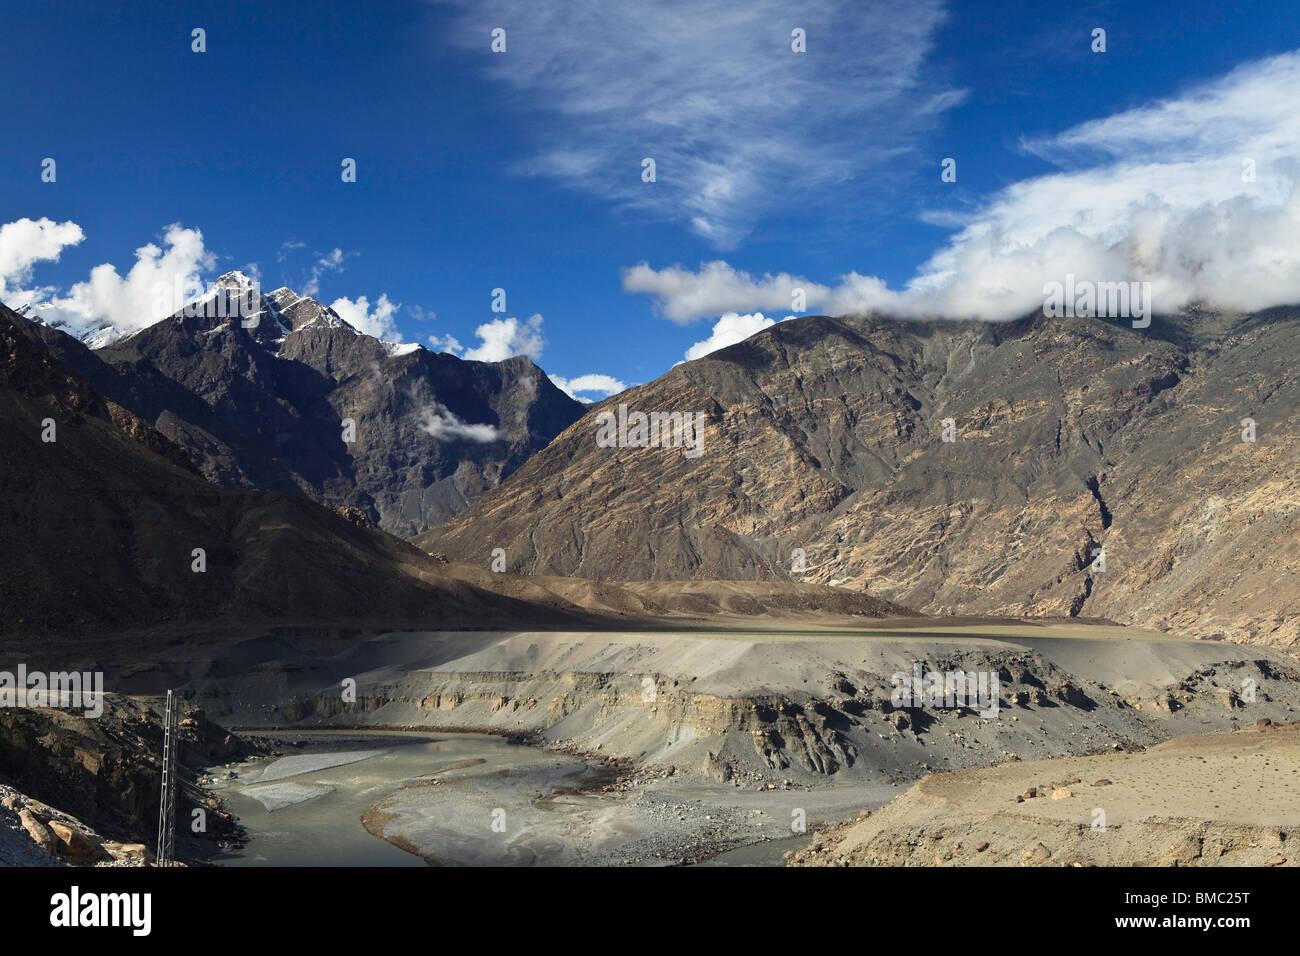 The junction of the Karakoram, Hindu Kush and Himalayan Ranges near Gilgit, Pakistan - Stock Image